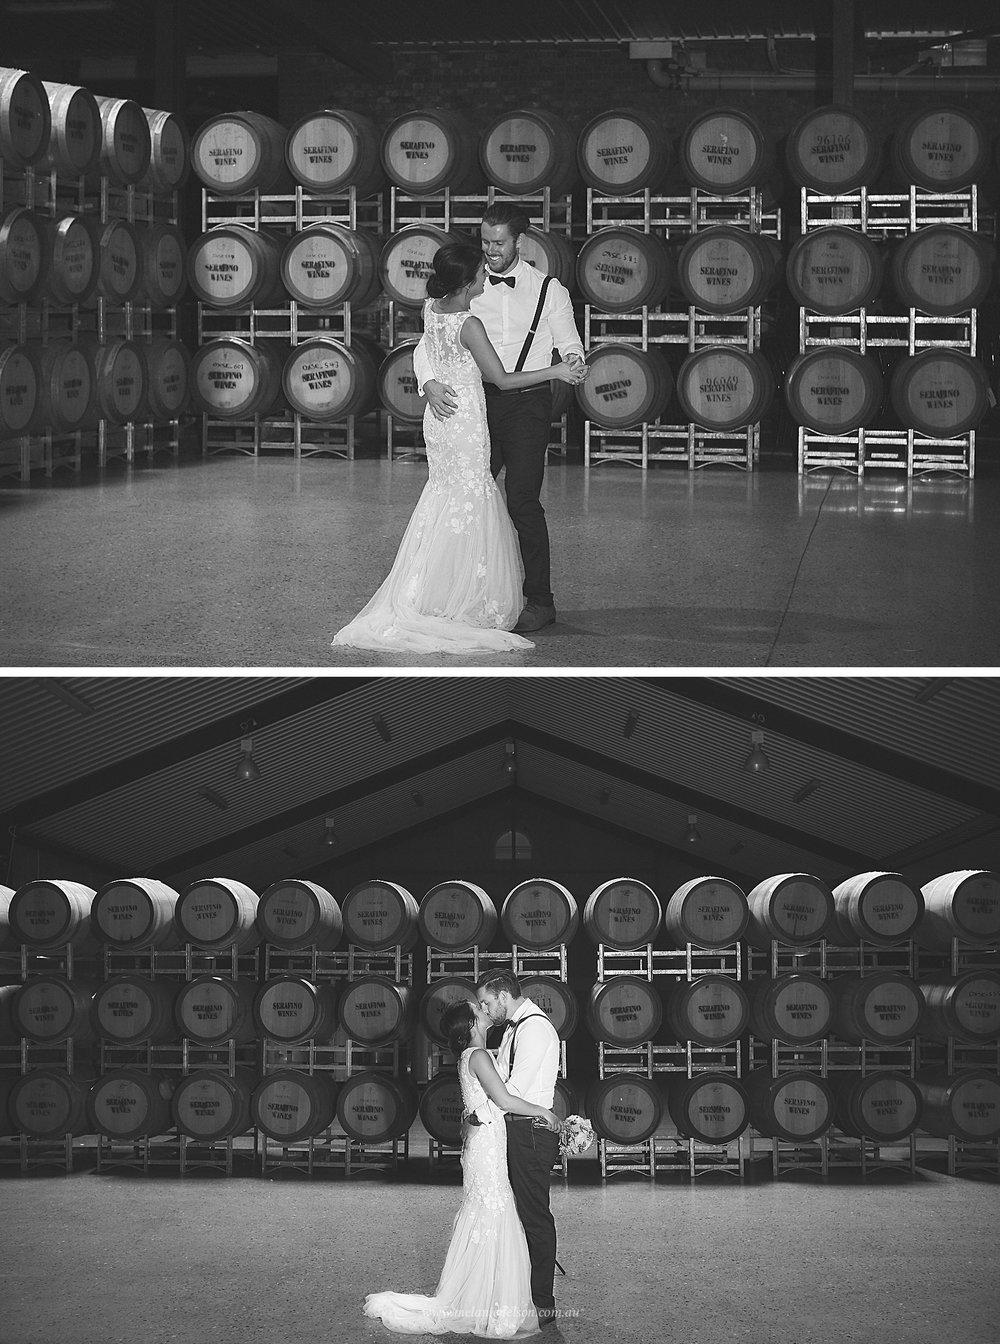 serafino_winery_wedding_photography006.jpg